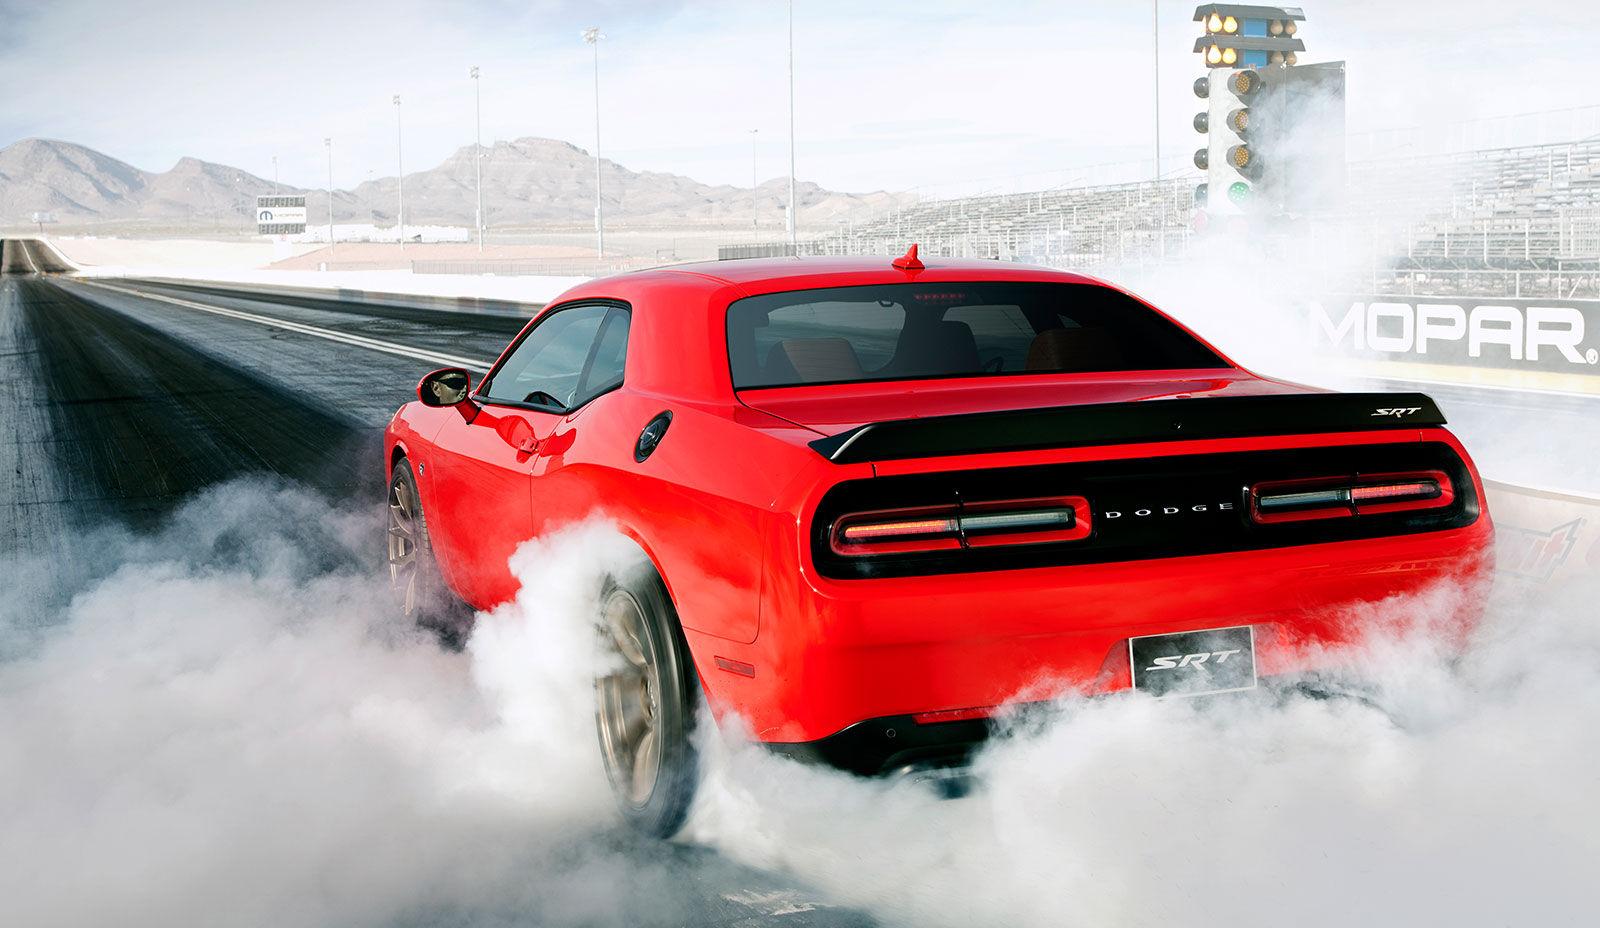 Best V8 Sedans And Coupes - Dodge Challenger SRT Hellcat